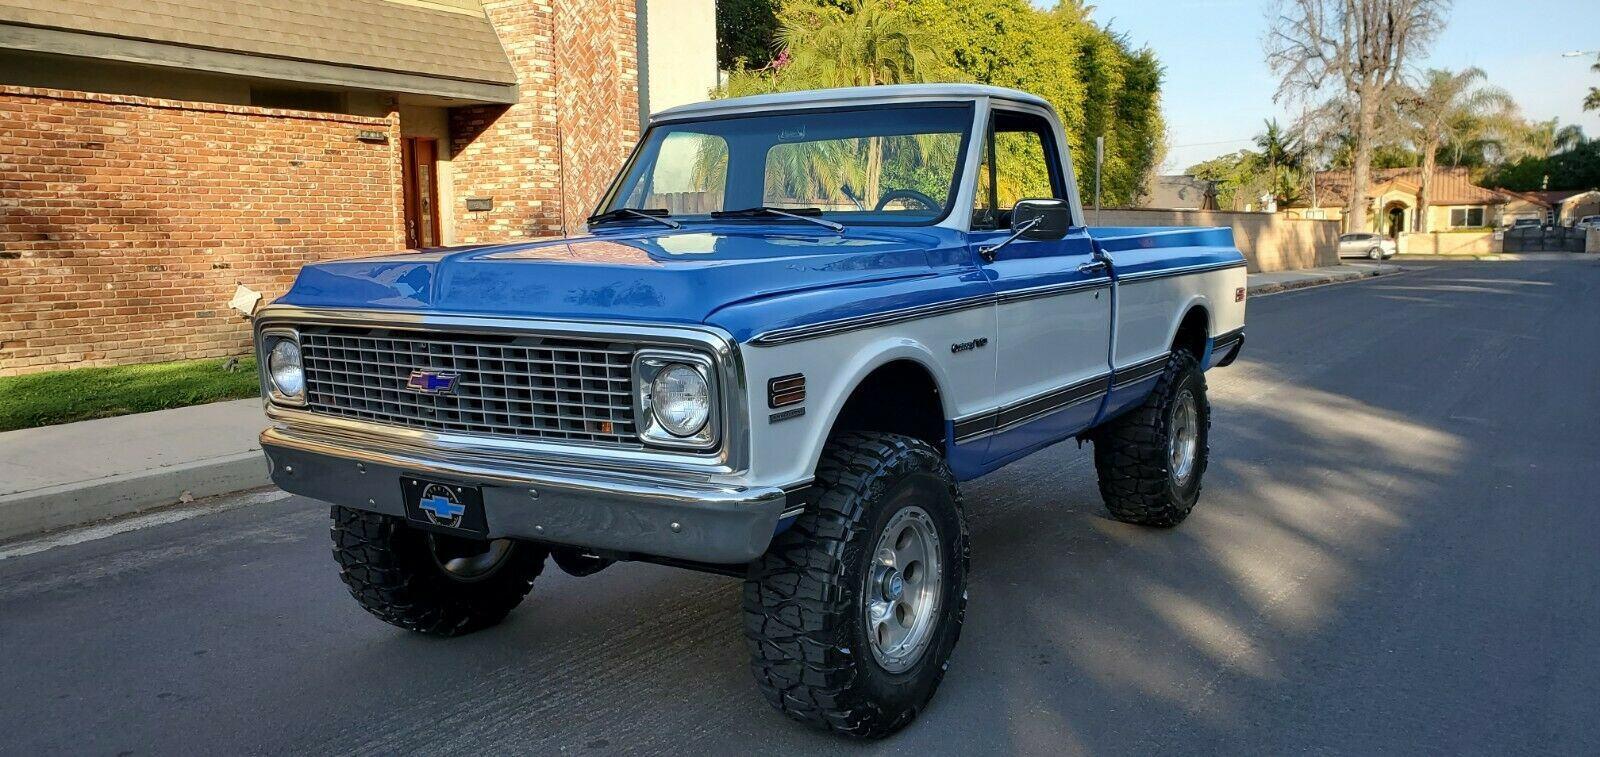 modified 1972 Chevrolet C/K Pickup 1500 K10 lifted